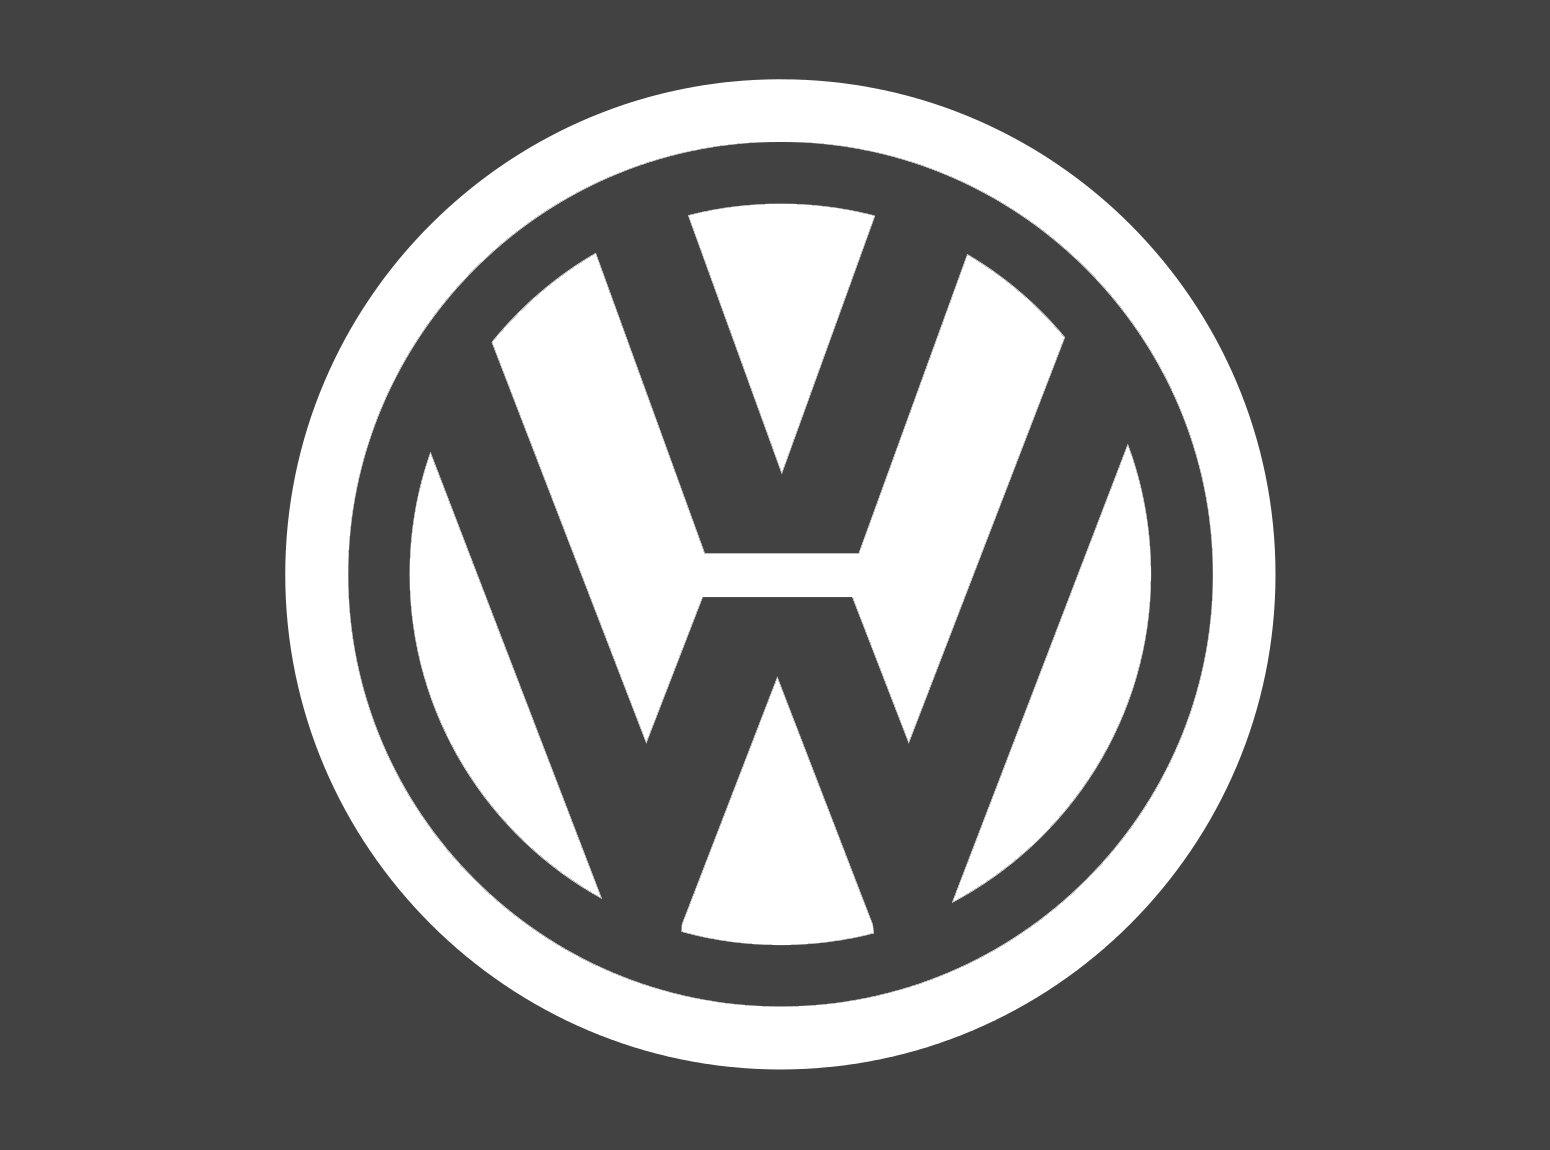 le logo volkswagen les marques de voitures. Black Bedroom Furniture Sets. Home Design Ideas